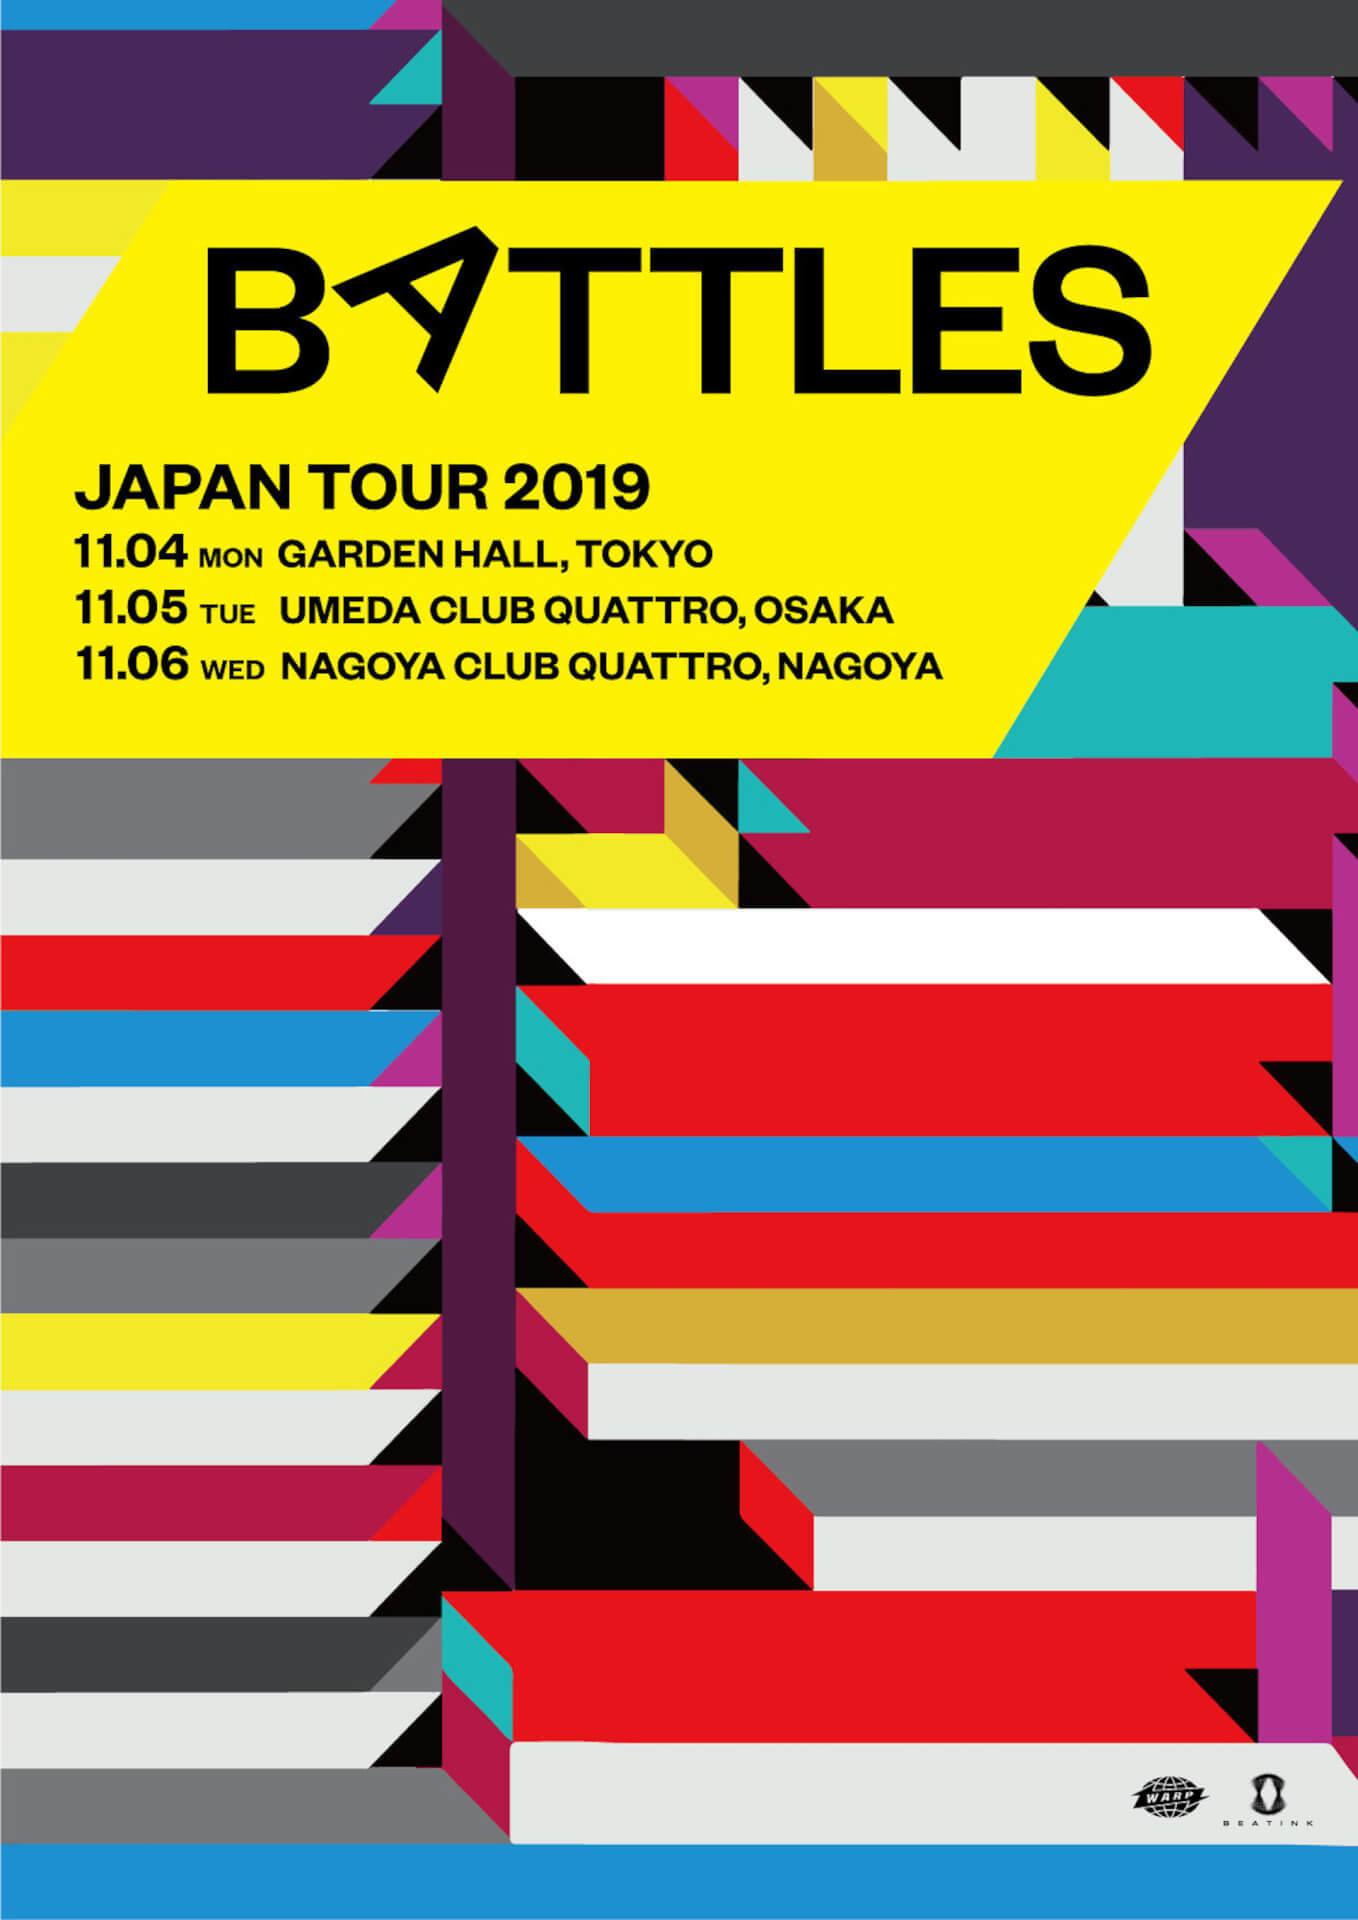 BATTLES最新アルバムの世界最速プレミア爆音試聴会の開催が決定!全国ツアーチケットも発売中 music191001_battles_2